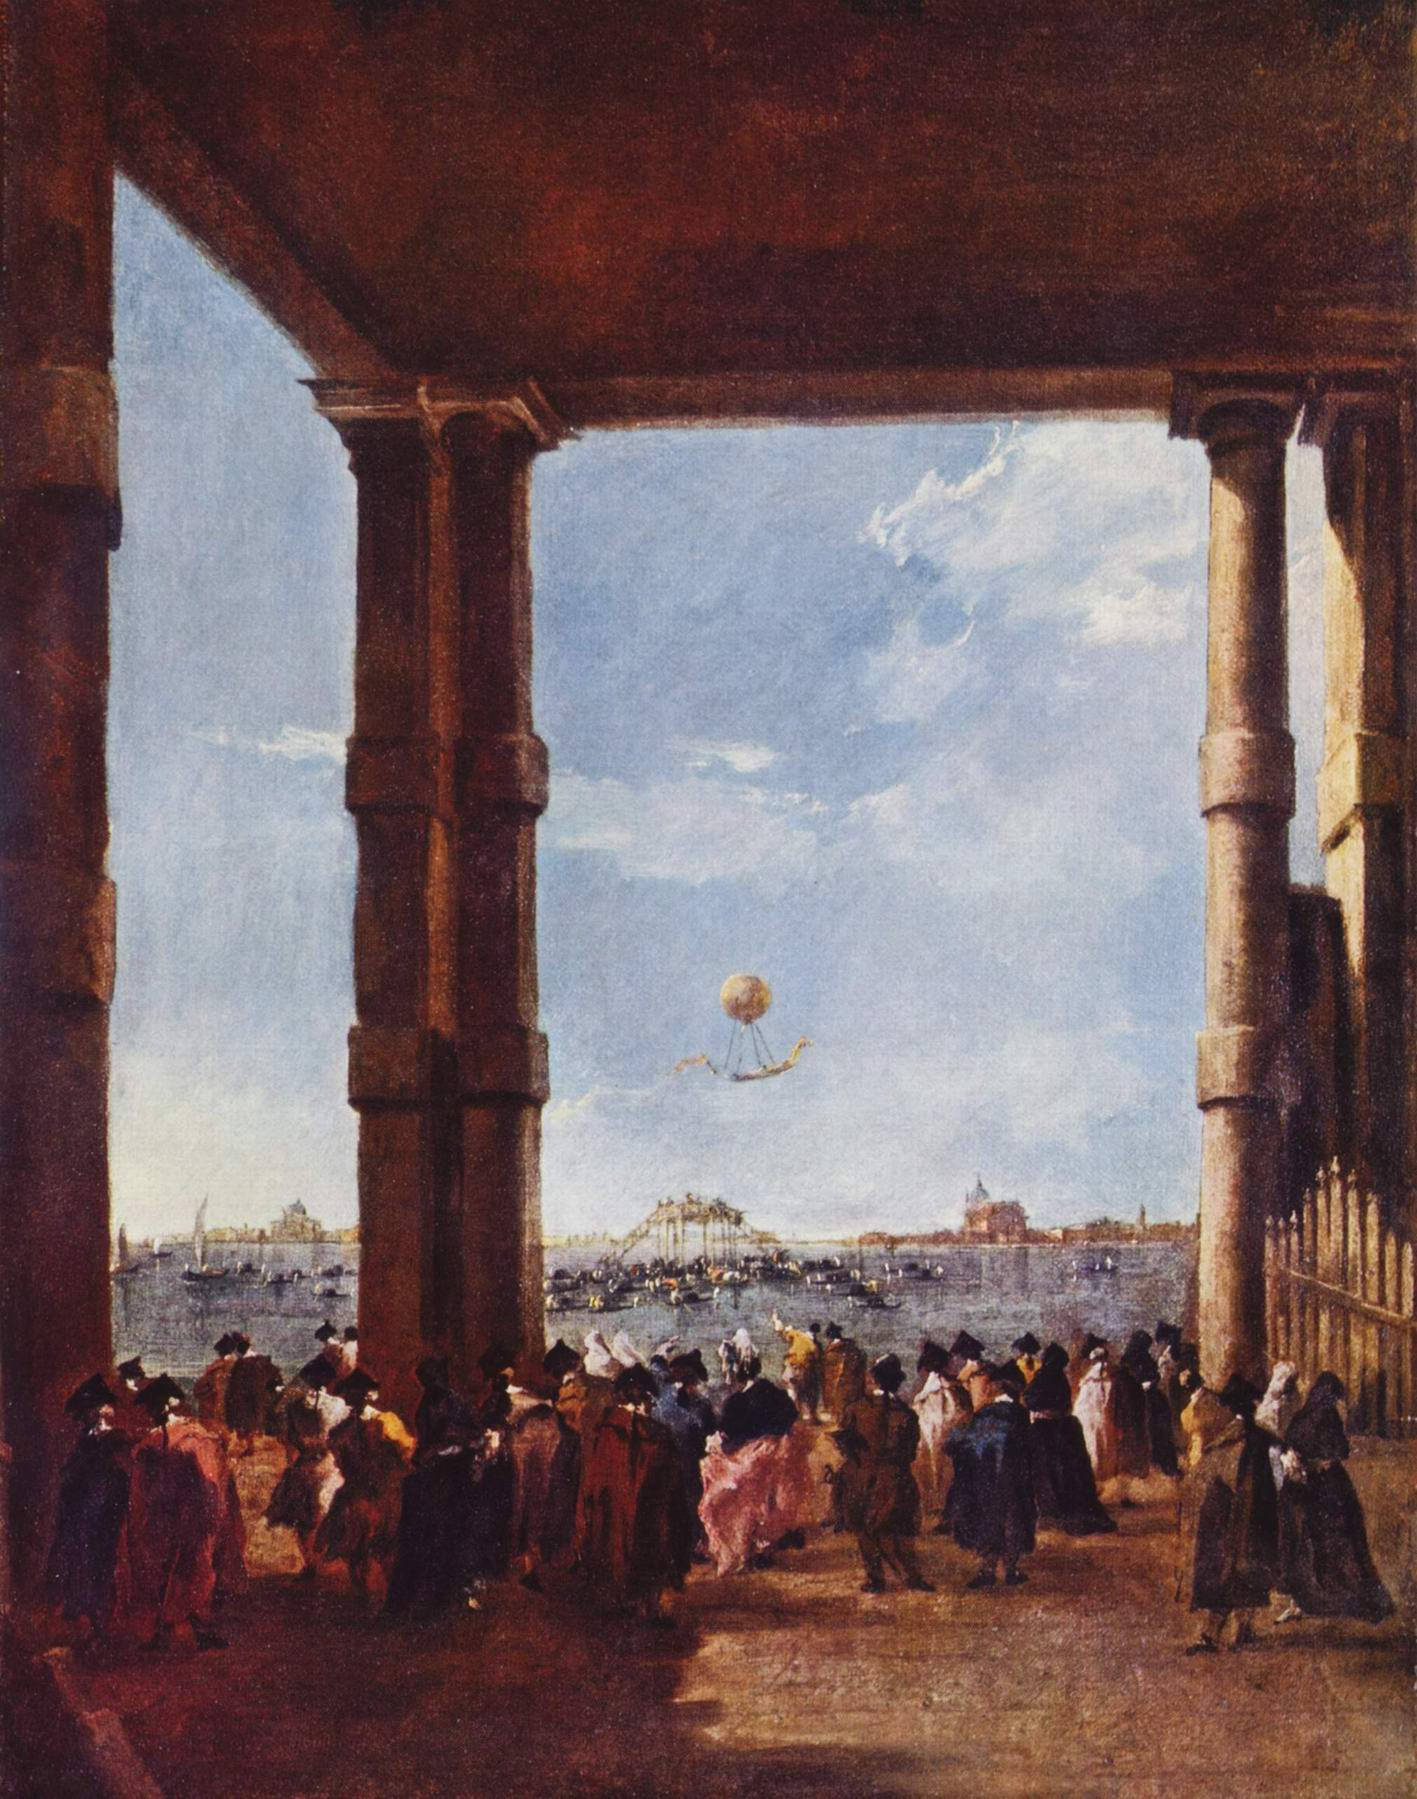 Подъем воздушного шара, Франческо Гварди